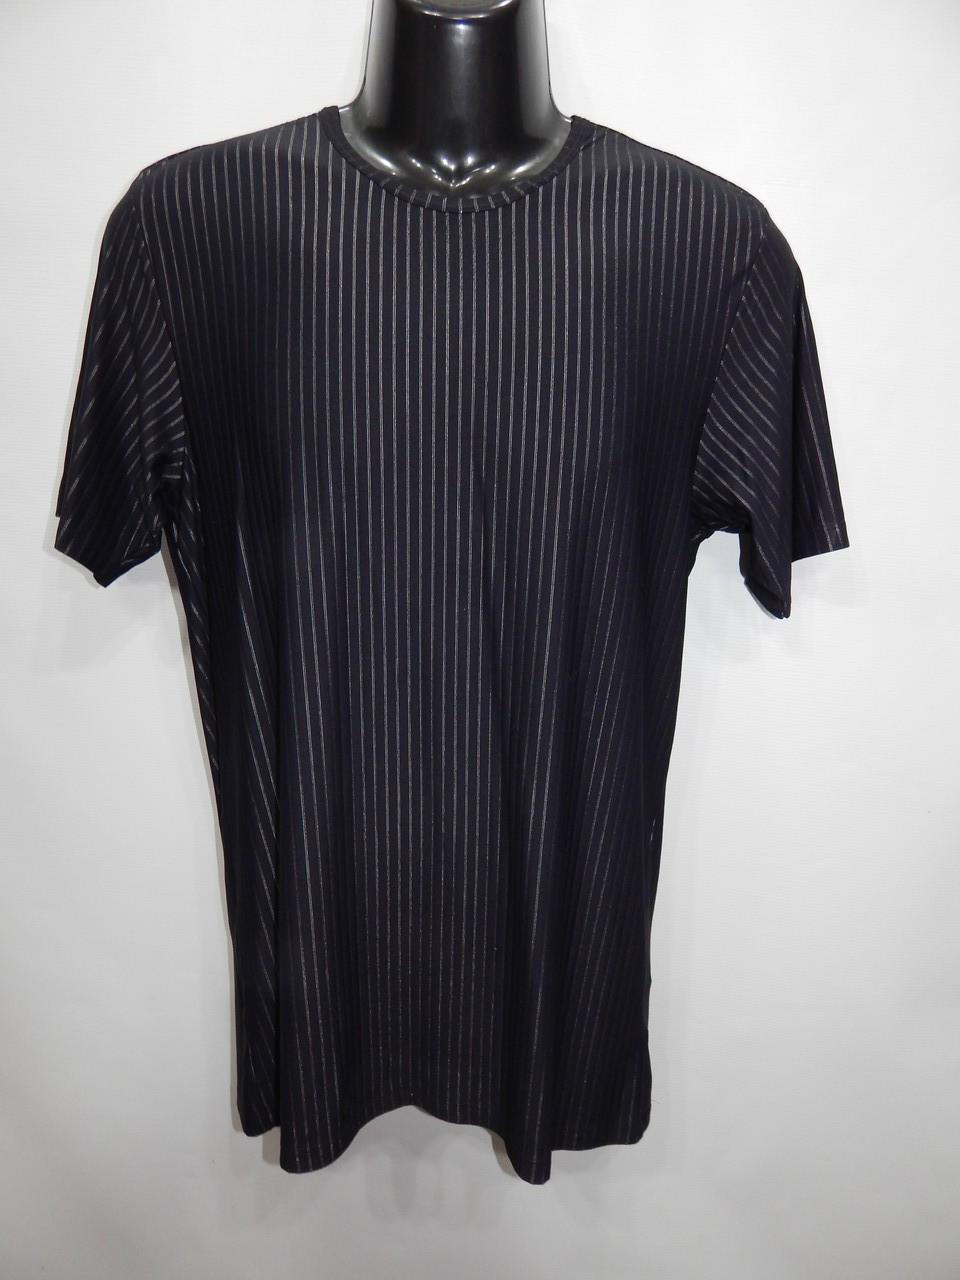 Мужская футболка легкая Schiesser р.50 402мф